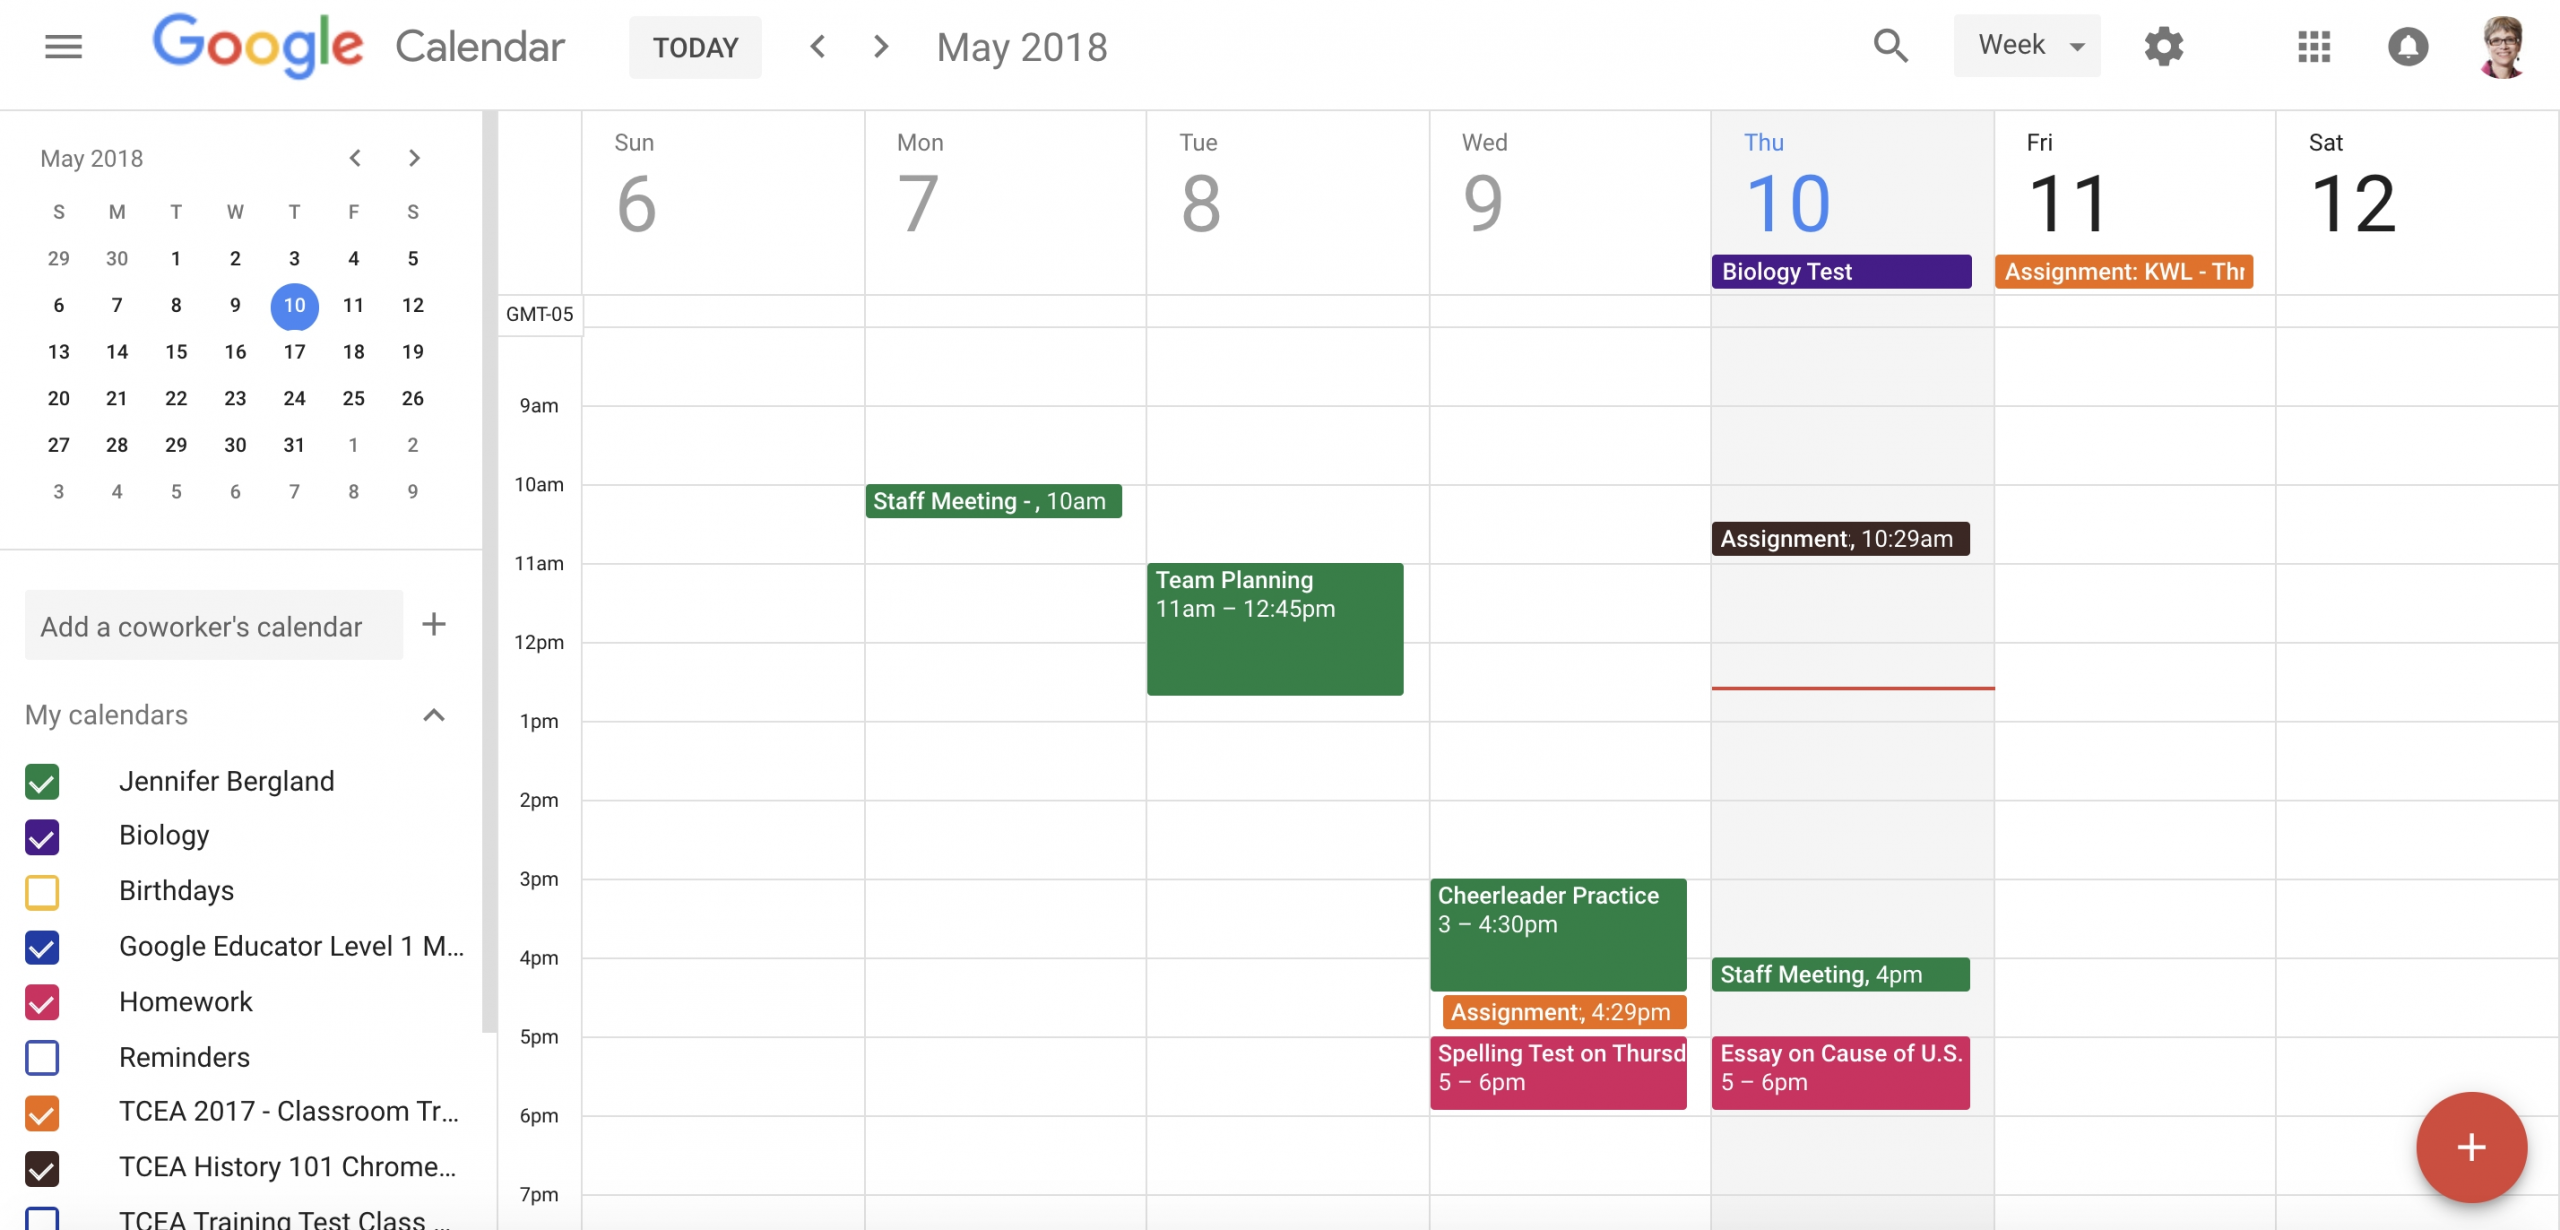 Get Google Images Calendar